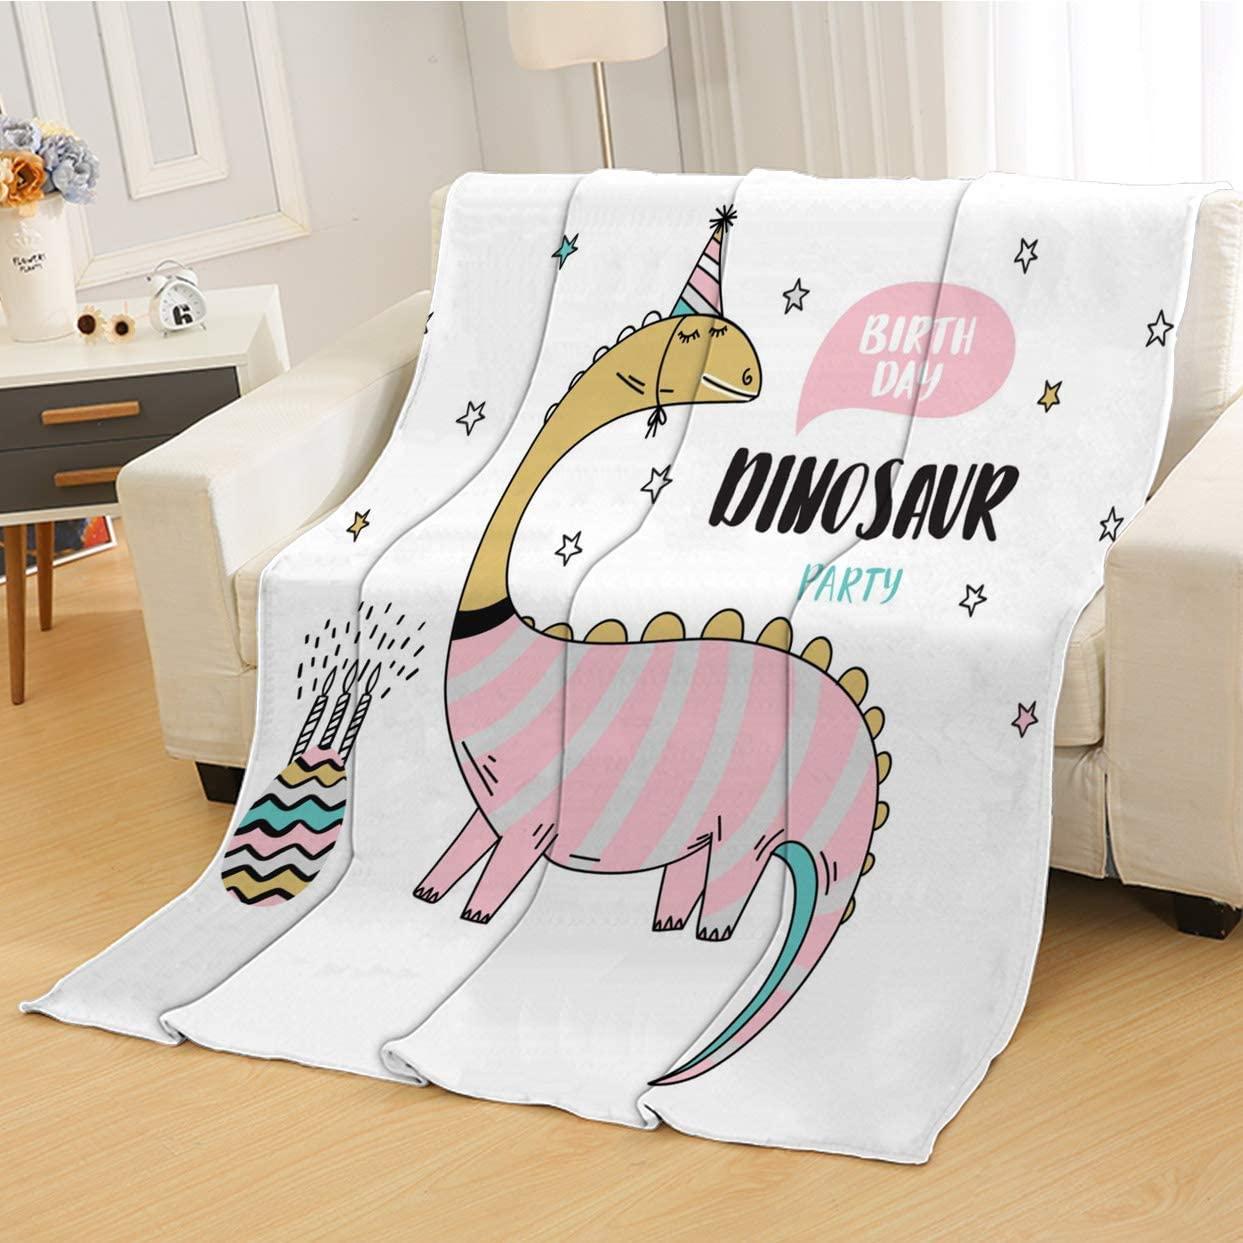 RLDSESS Birthday Soft Baby Blanket, All Season Blanket,Birthday Cute Cartoon Dinosaur,Soft Weighted Blanket,Baby Size: 31Wx47L inch